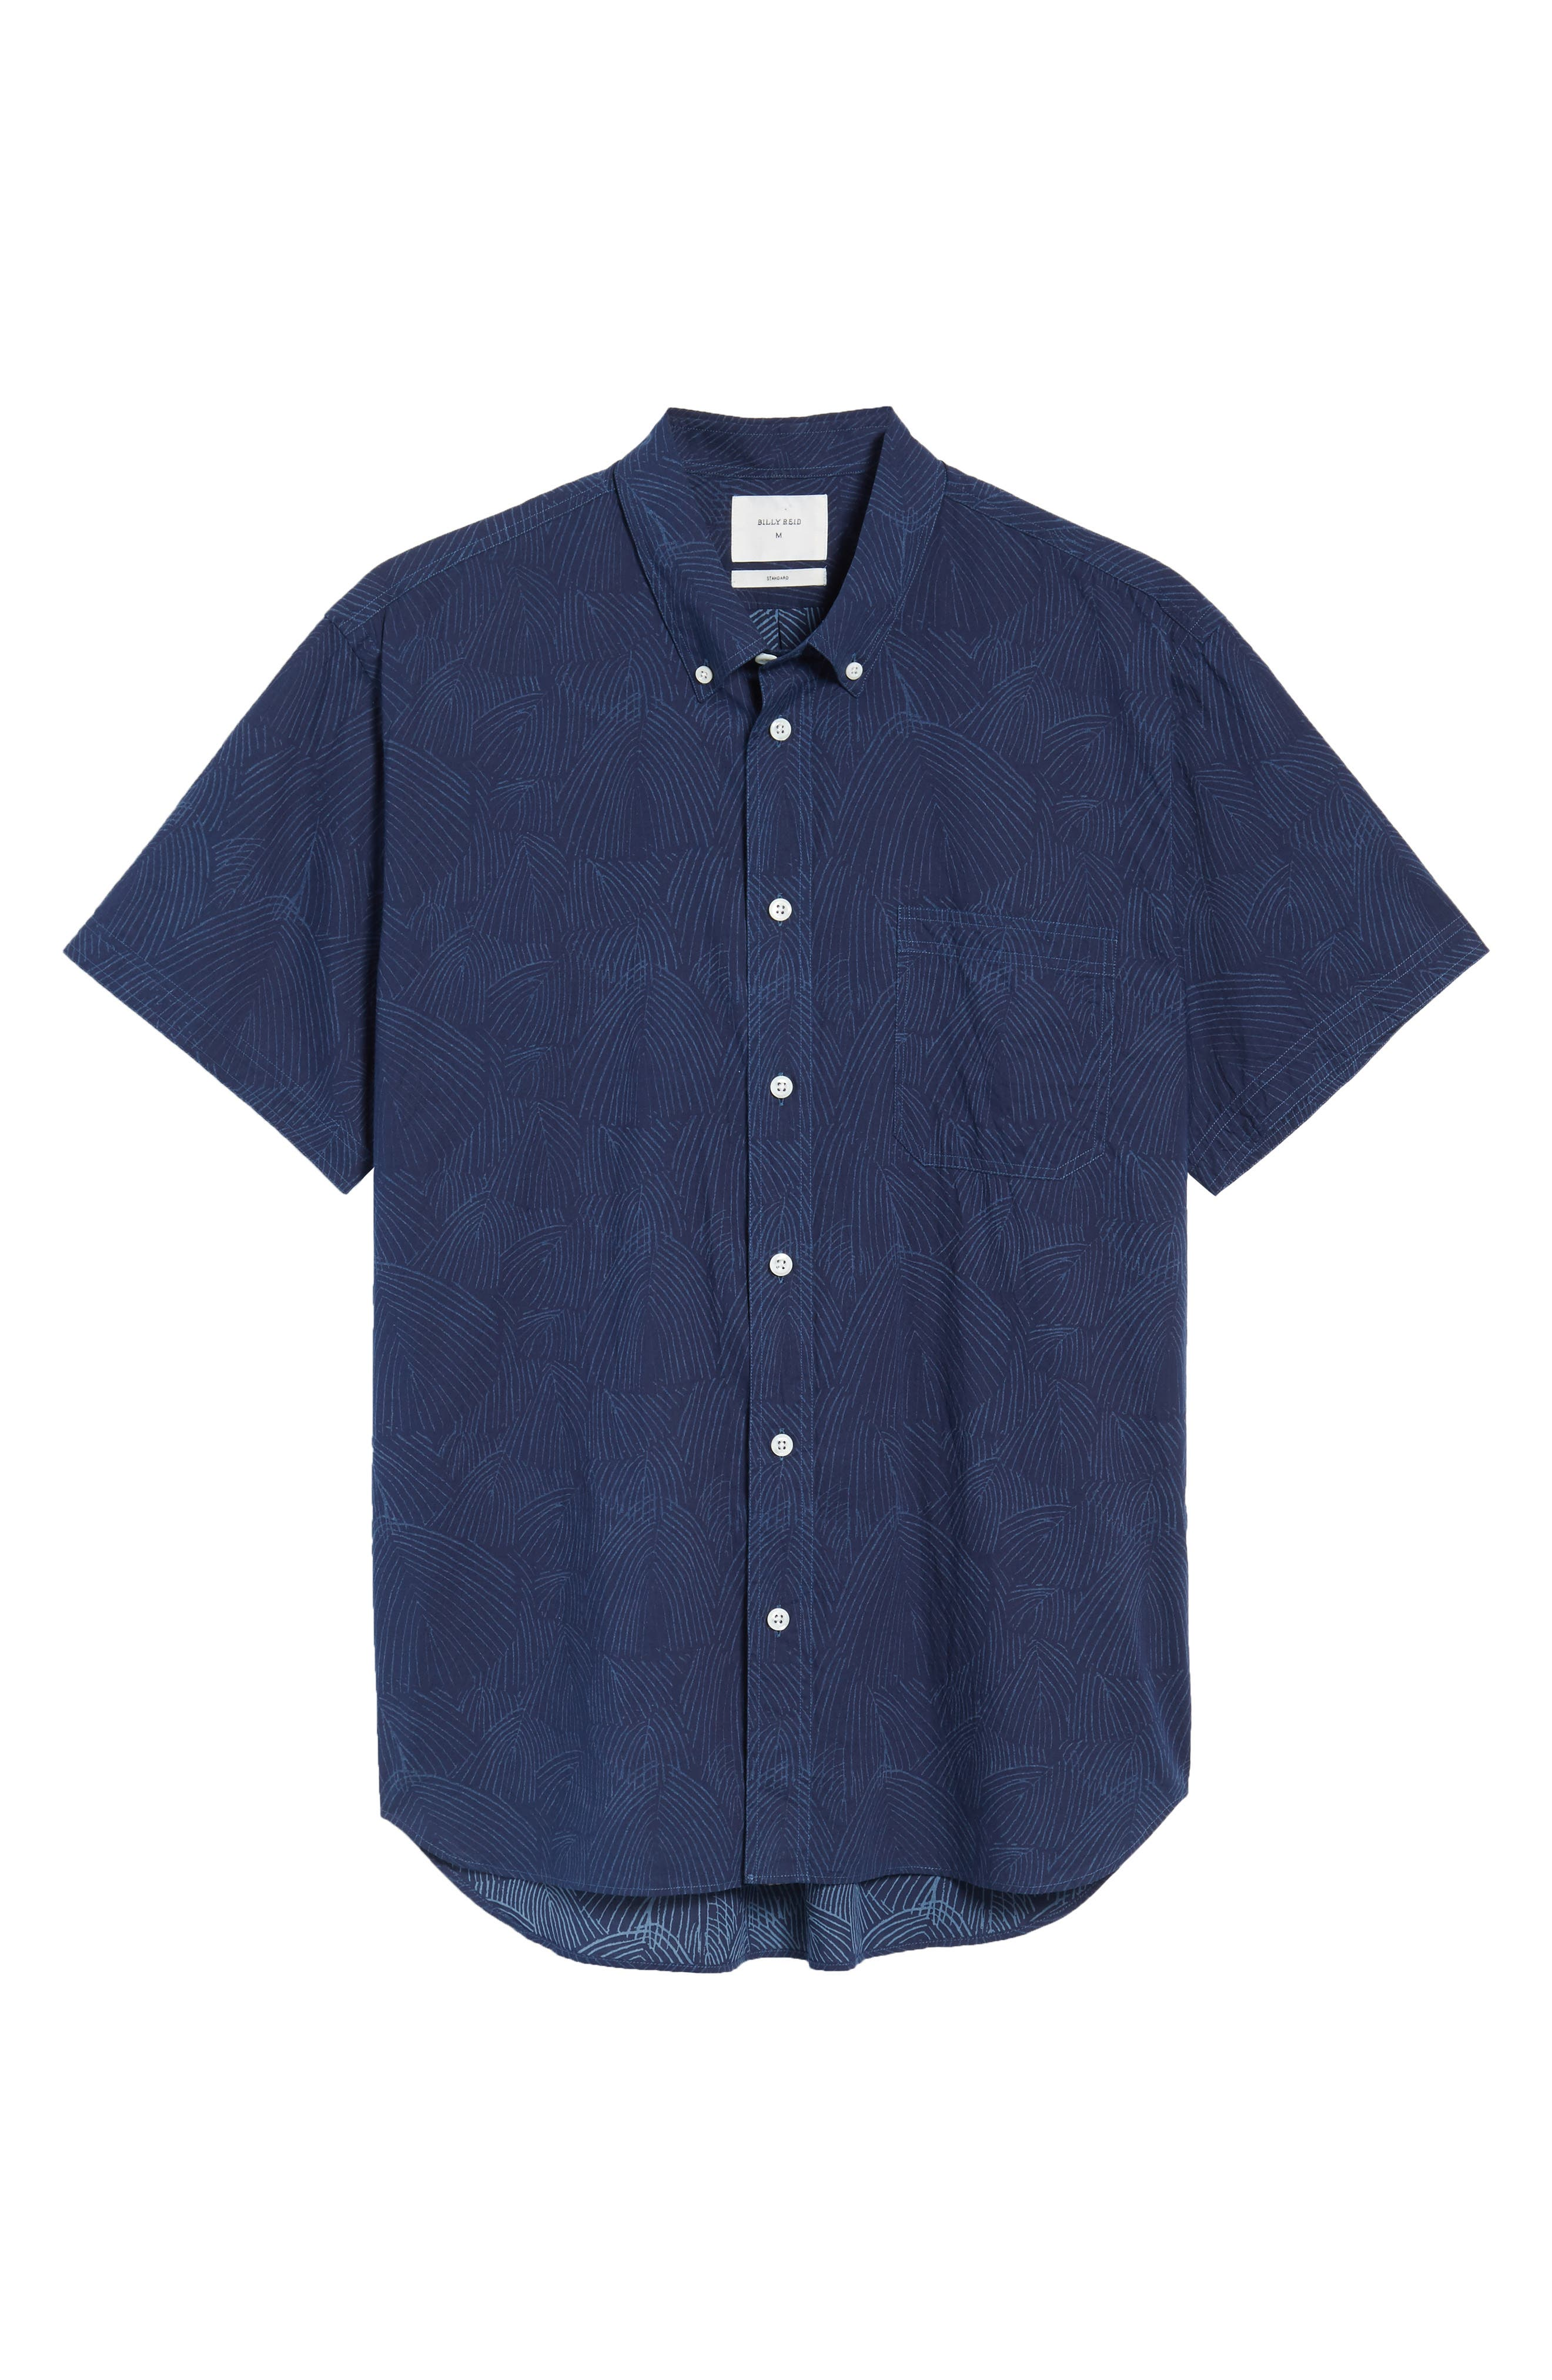 Tuscumbia Slim Fit Sport Shirt,                             Alternate thumbnail 6, color,                             407